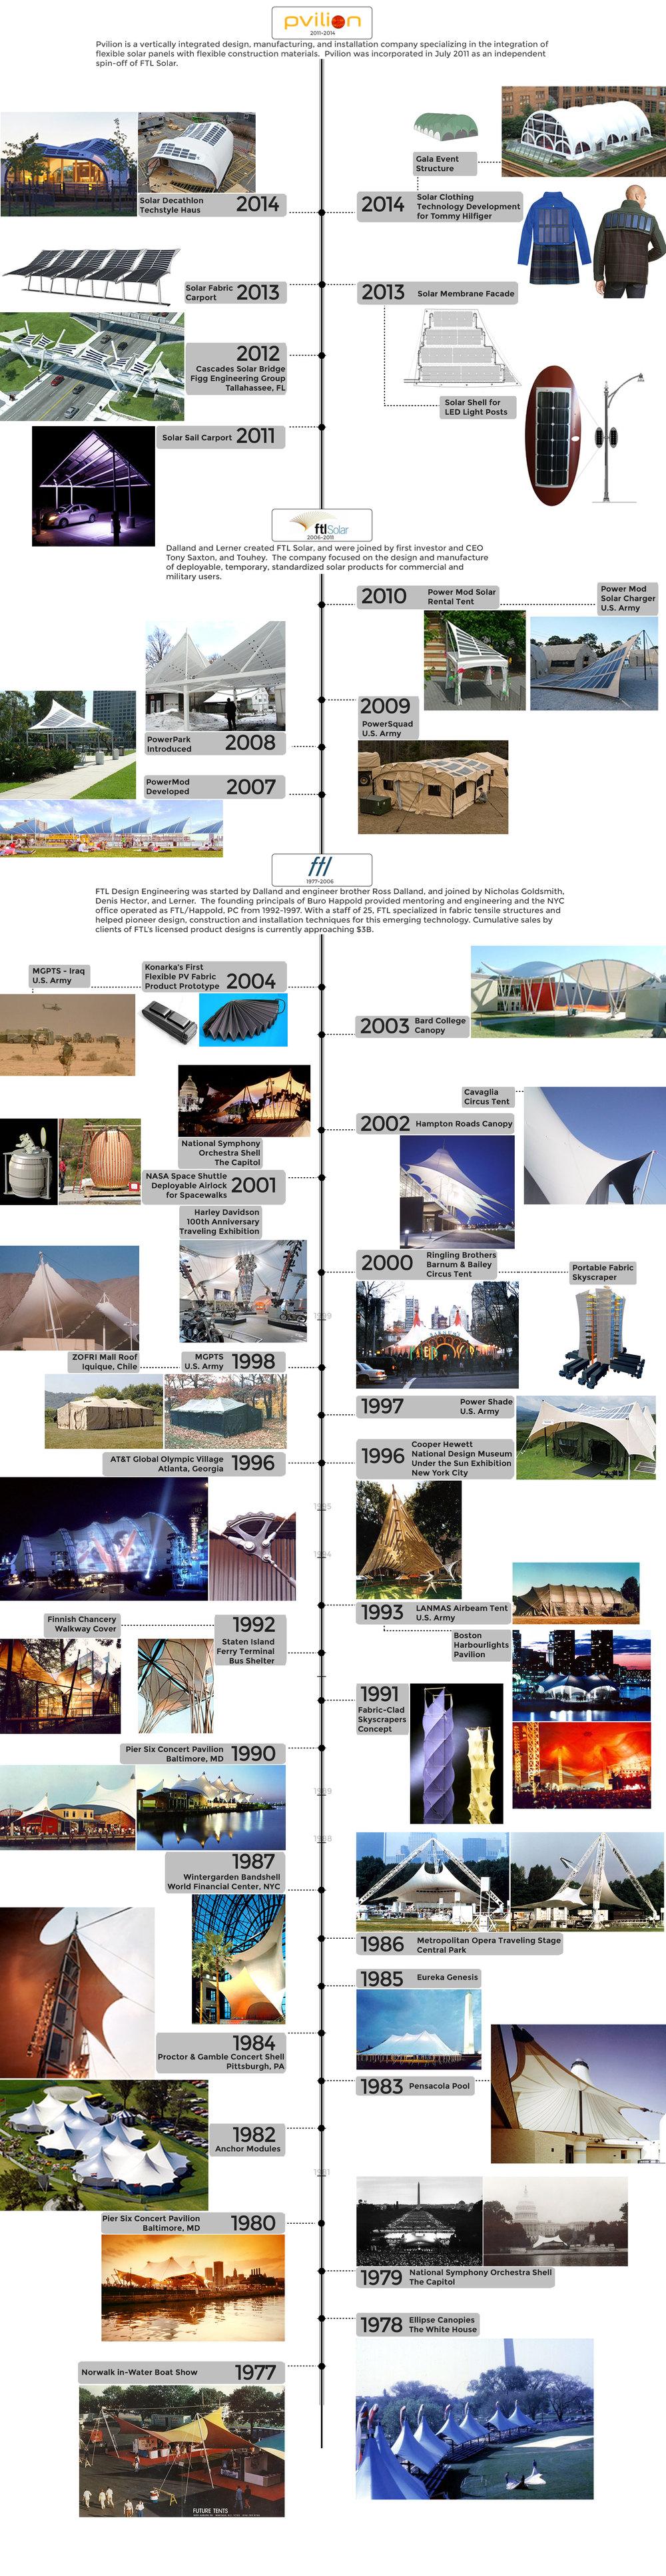 History-Timeline-Oct-21-bottom.jpg